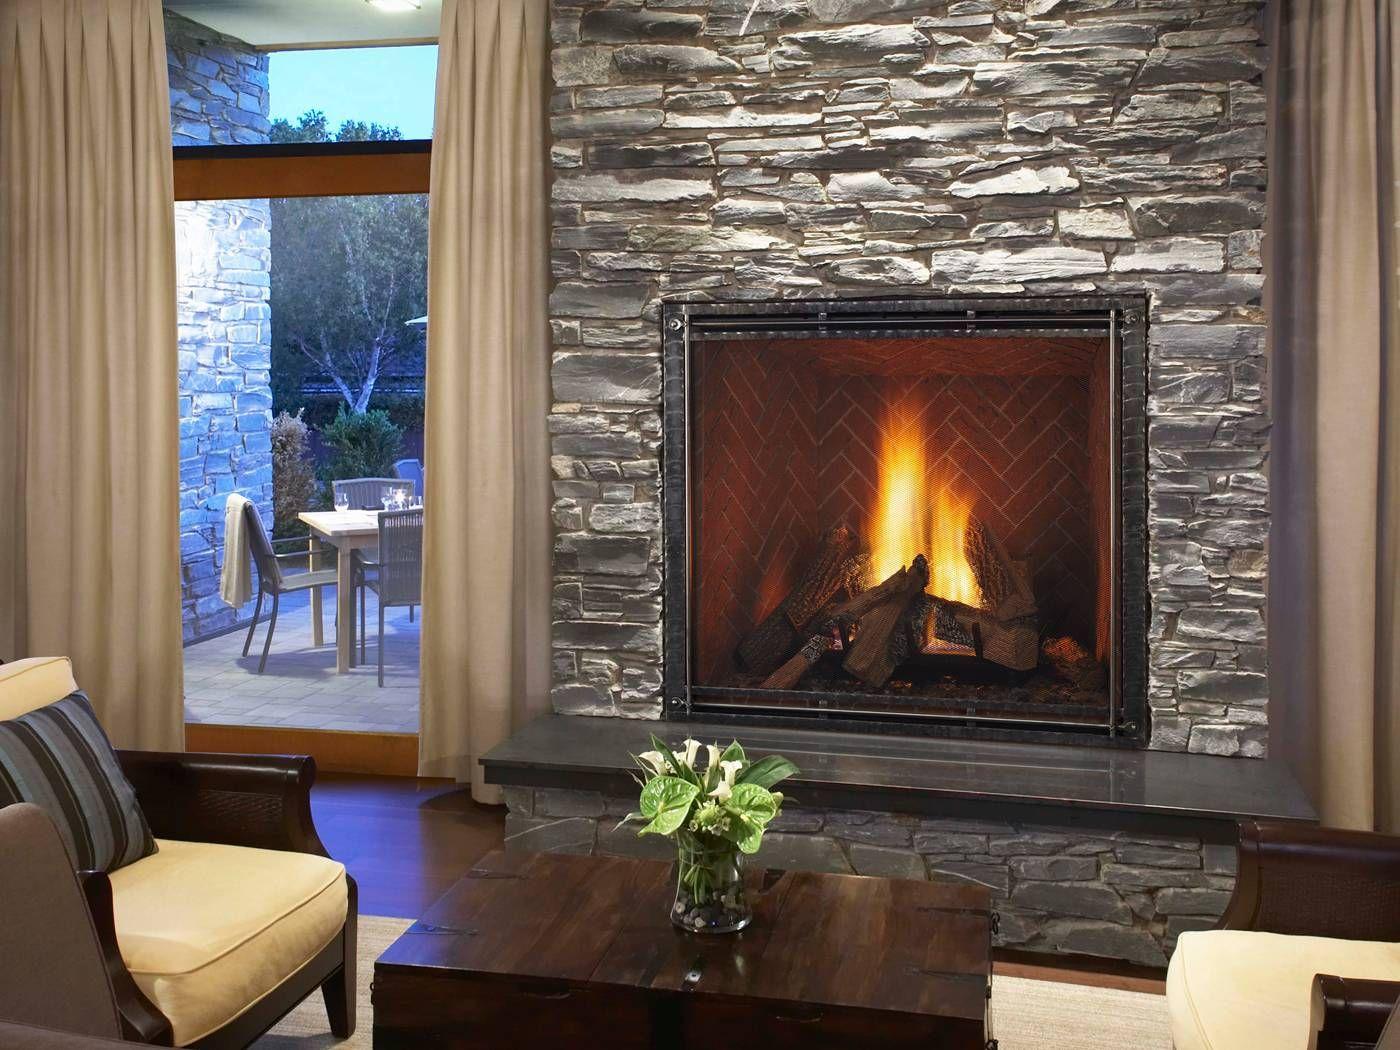 Heatilator Fireplace Parts Fresh True Fireplace by Heat N Glo Huge Fire Box for Maximum